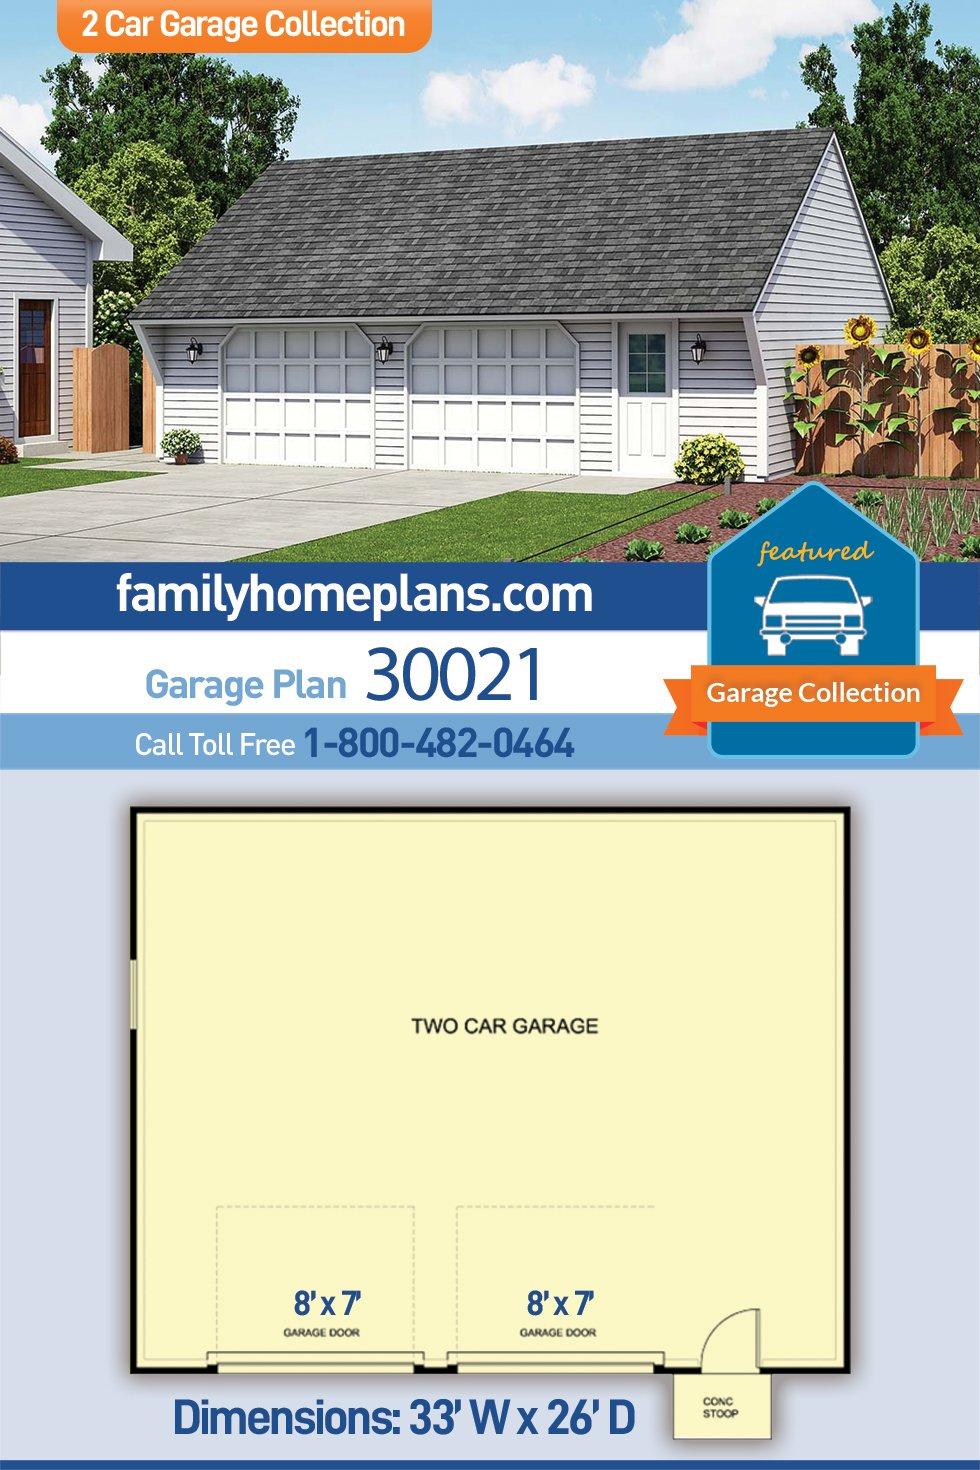 Cape Cod, Saltbox, Traditional 2 Car Garage Plan 30021